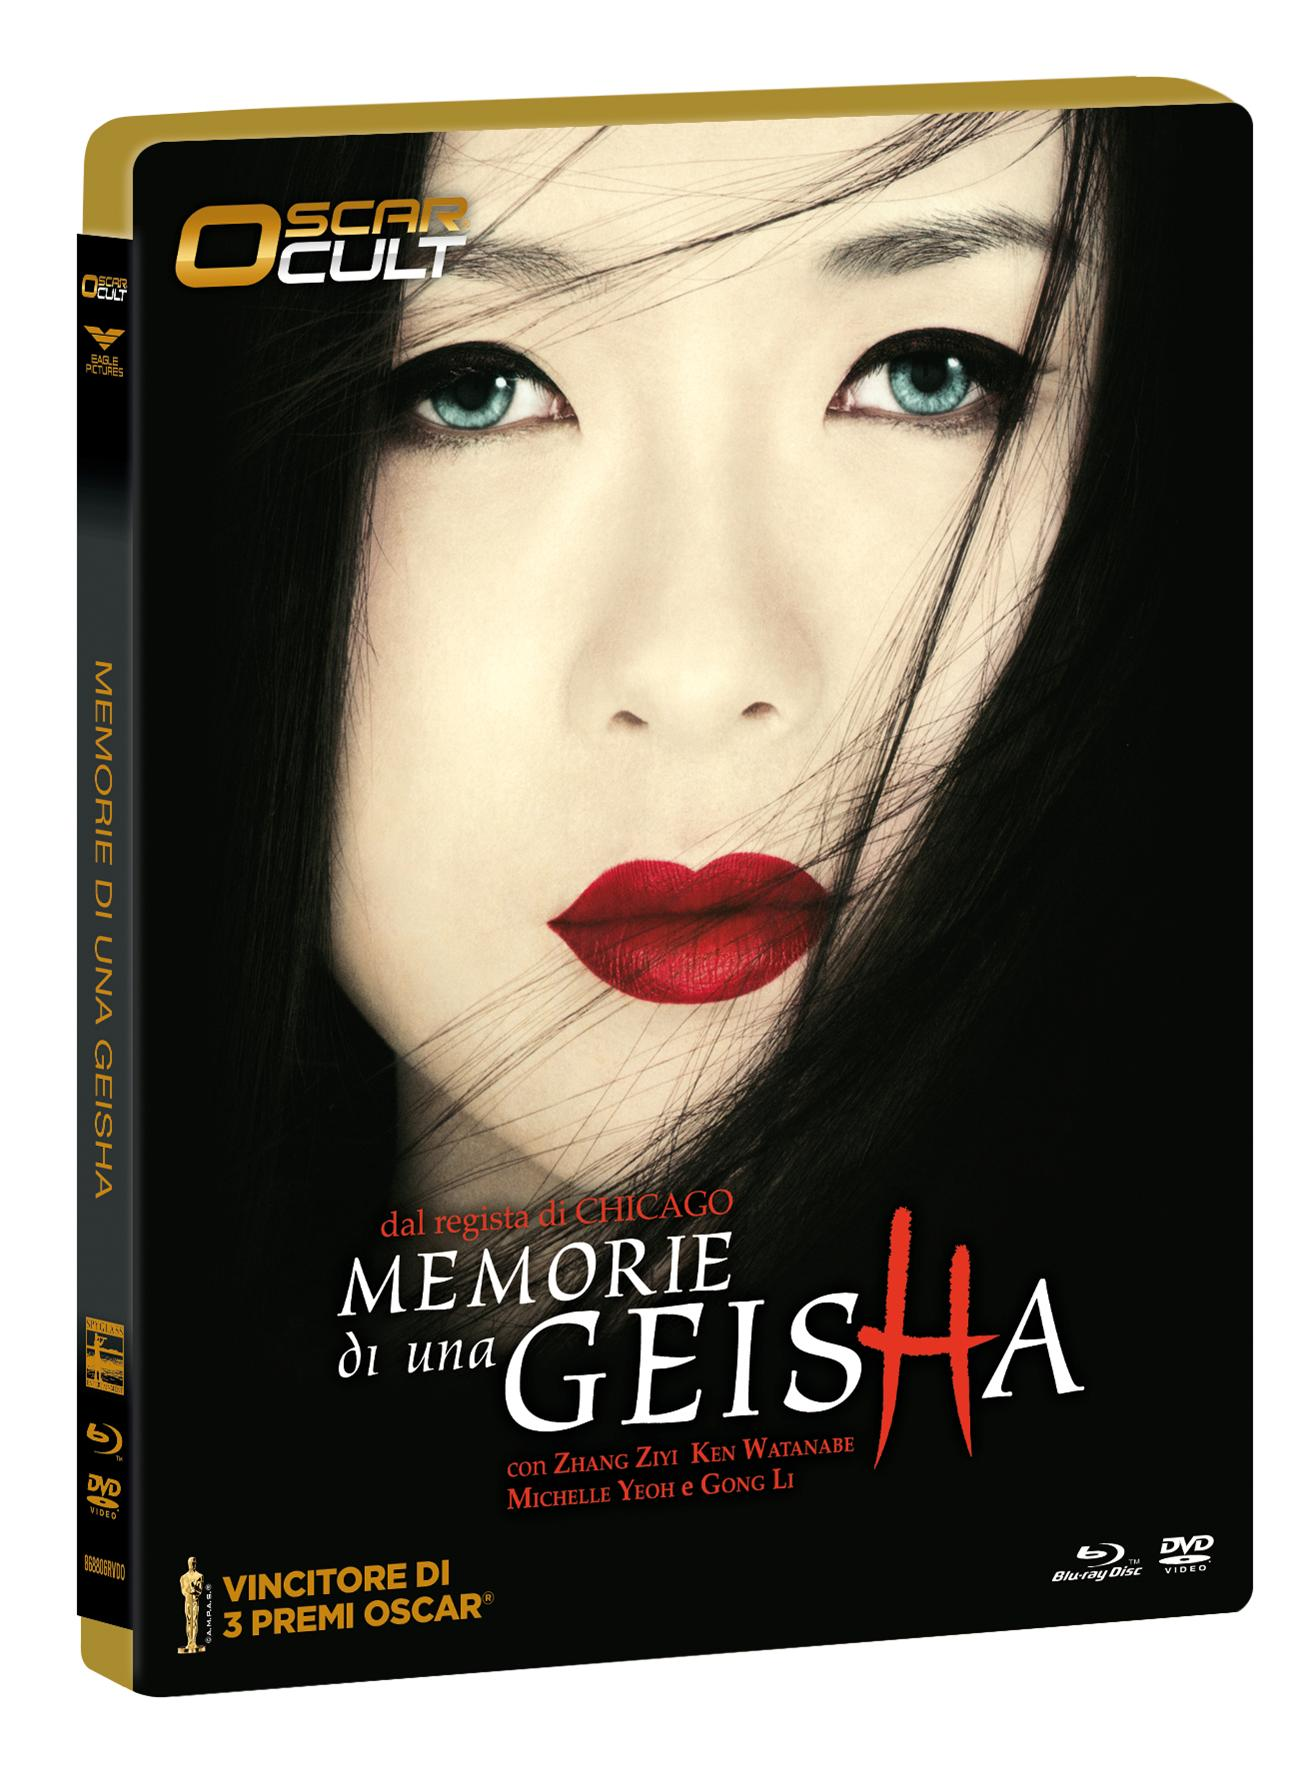 MEMORIE DI UNA GEISHA (BLU-RAY+DVD)